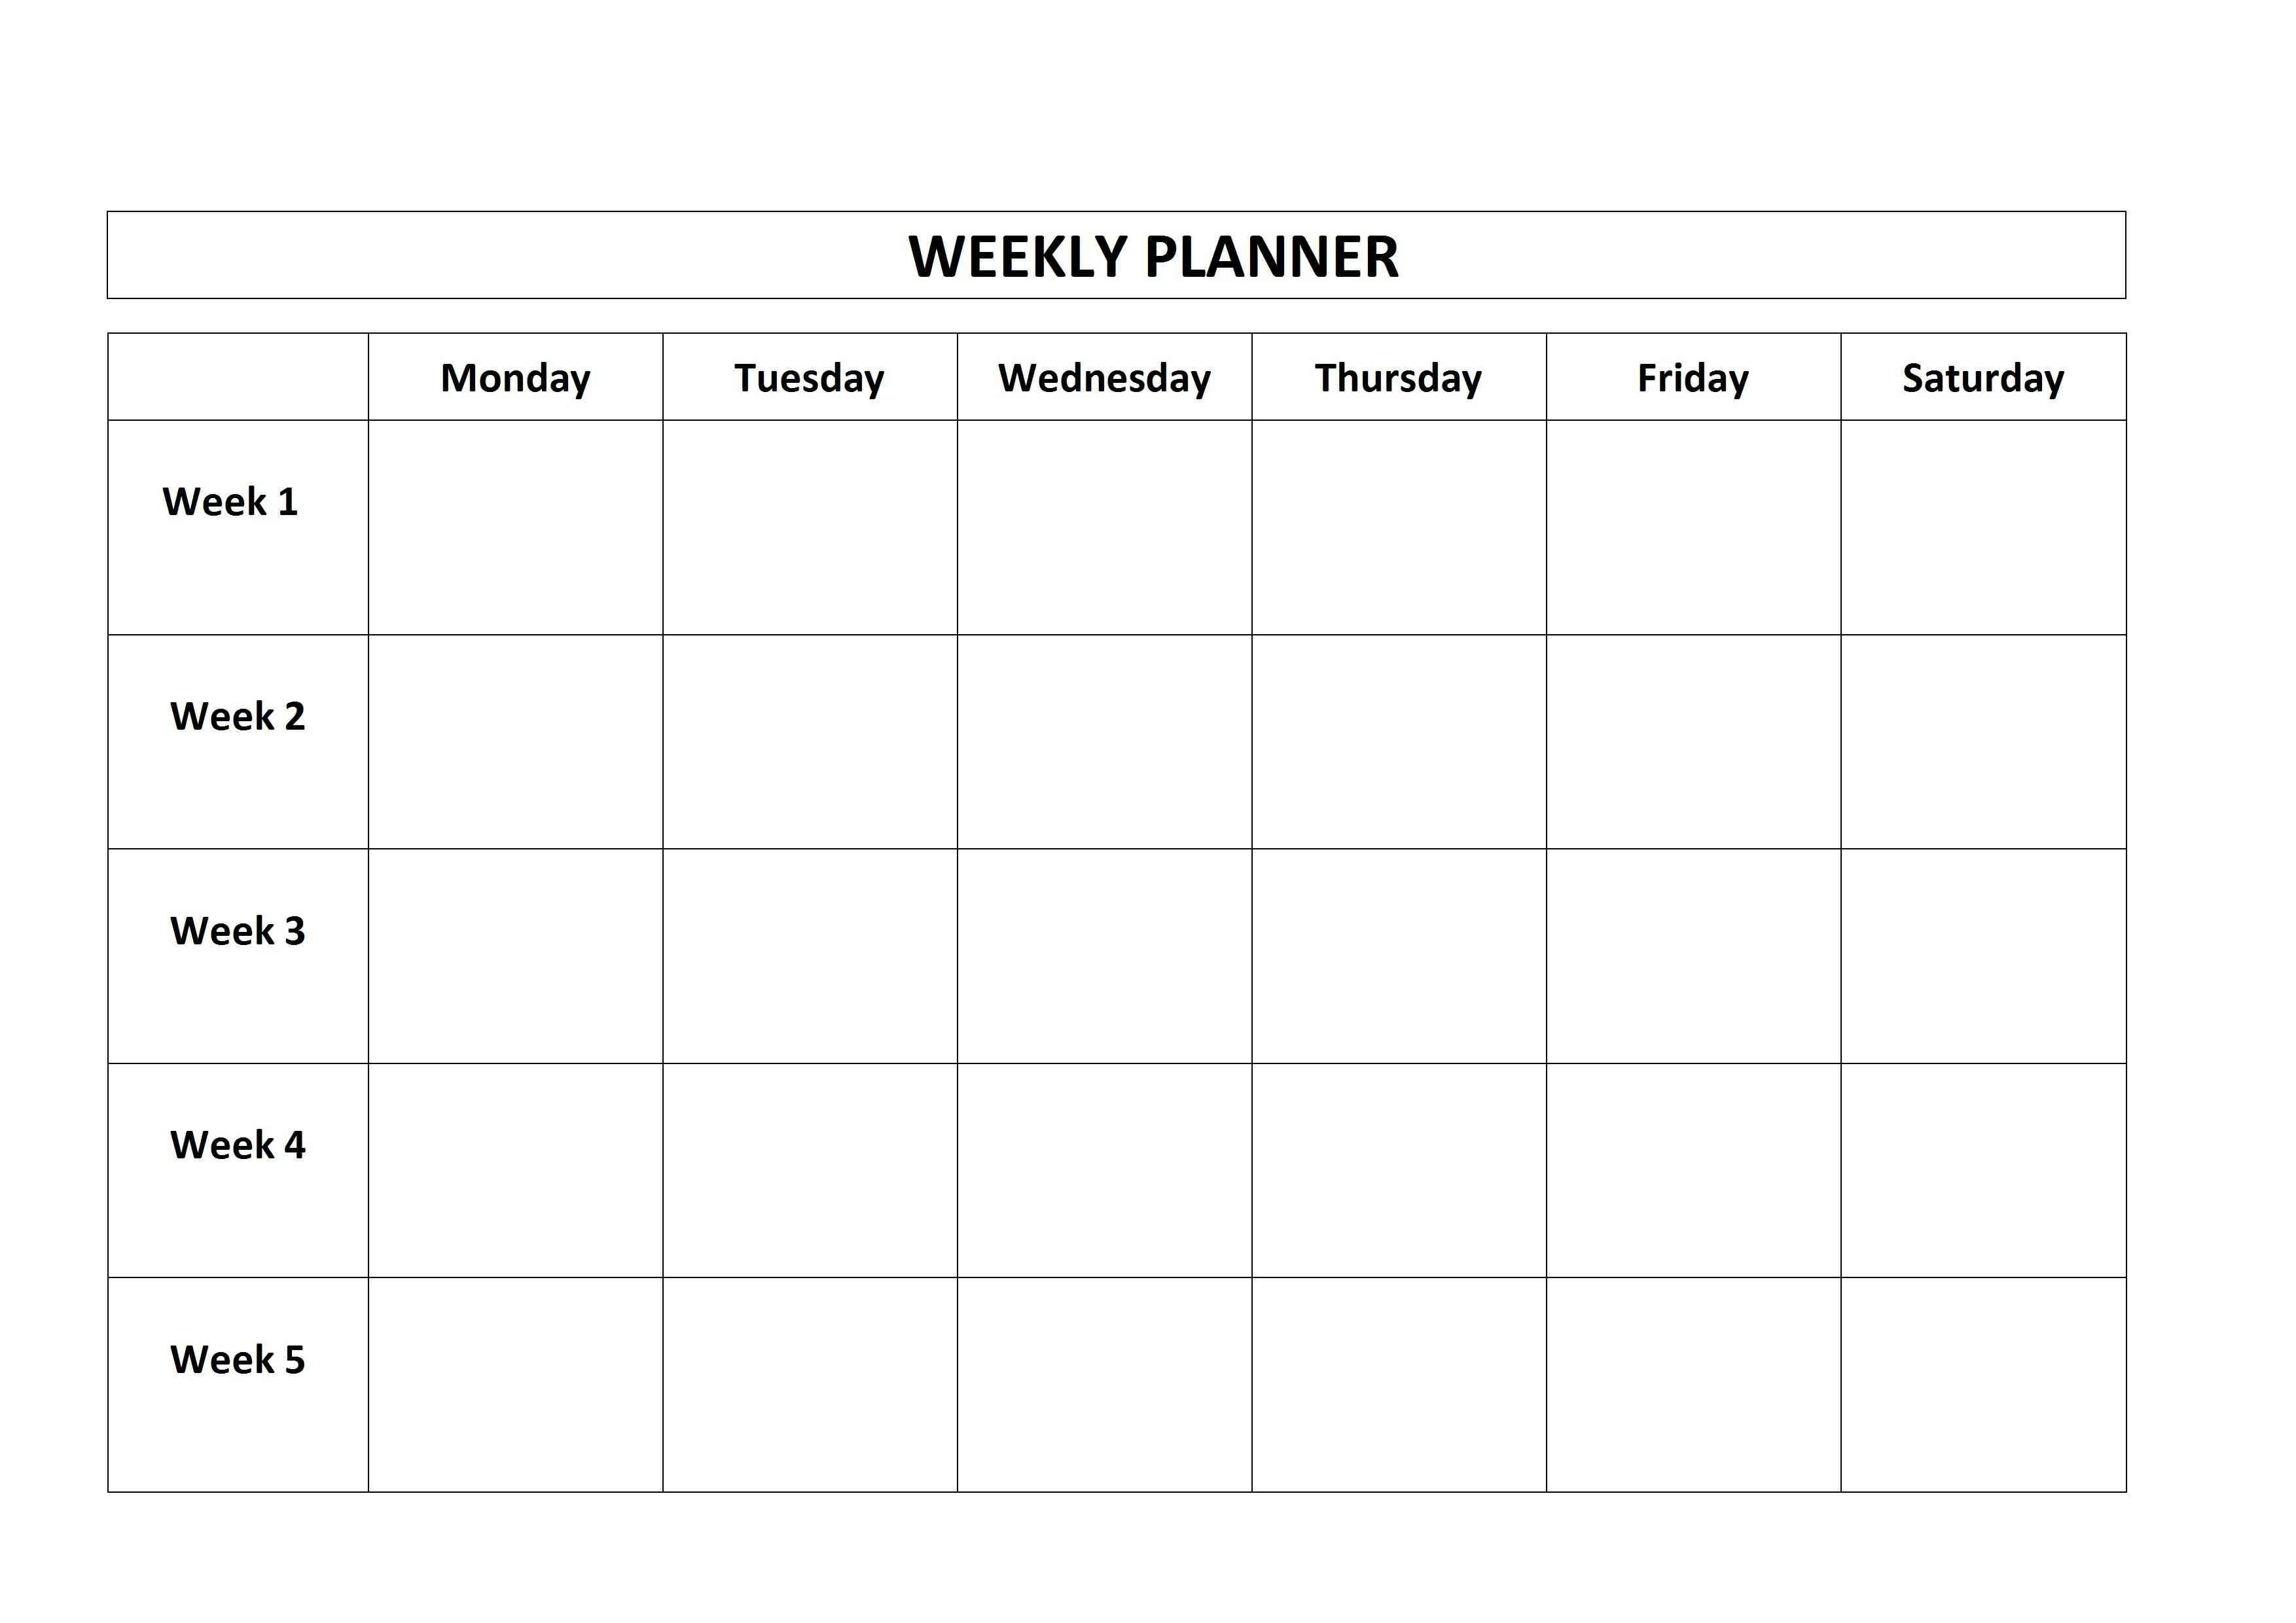 Free Printable Weekly Planner Monday Friday School Calendar-Monday To Friday Blank Calendar Printable